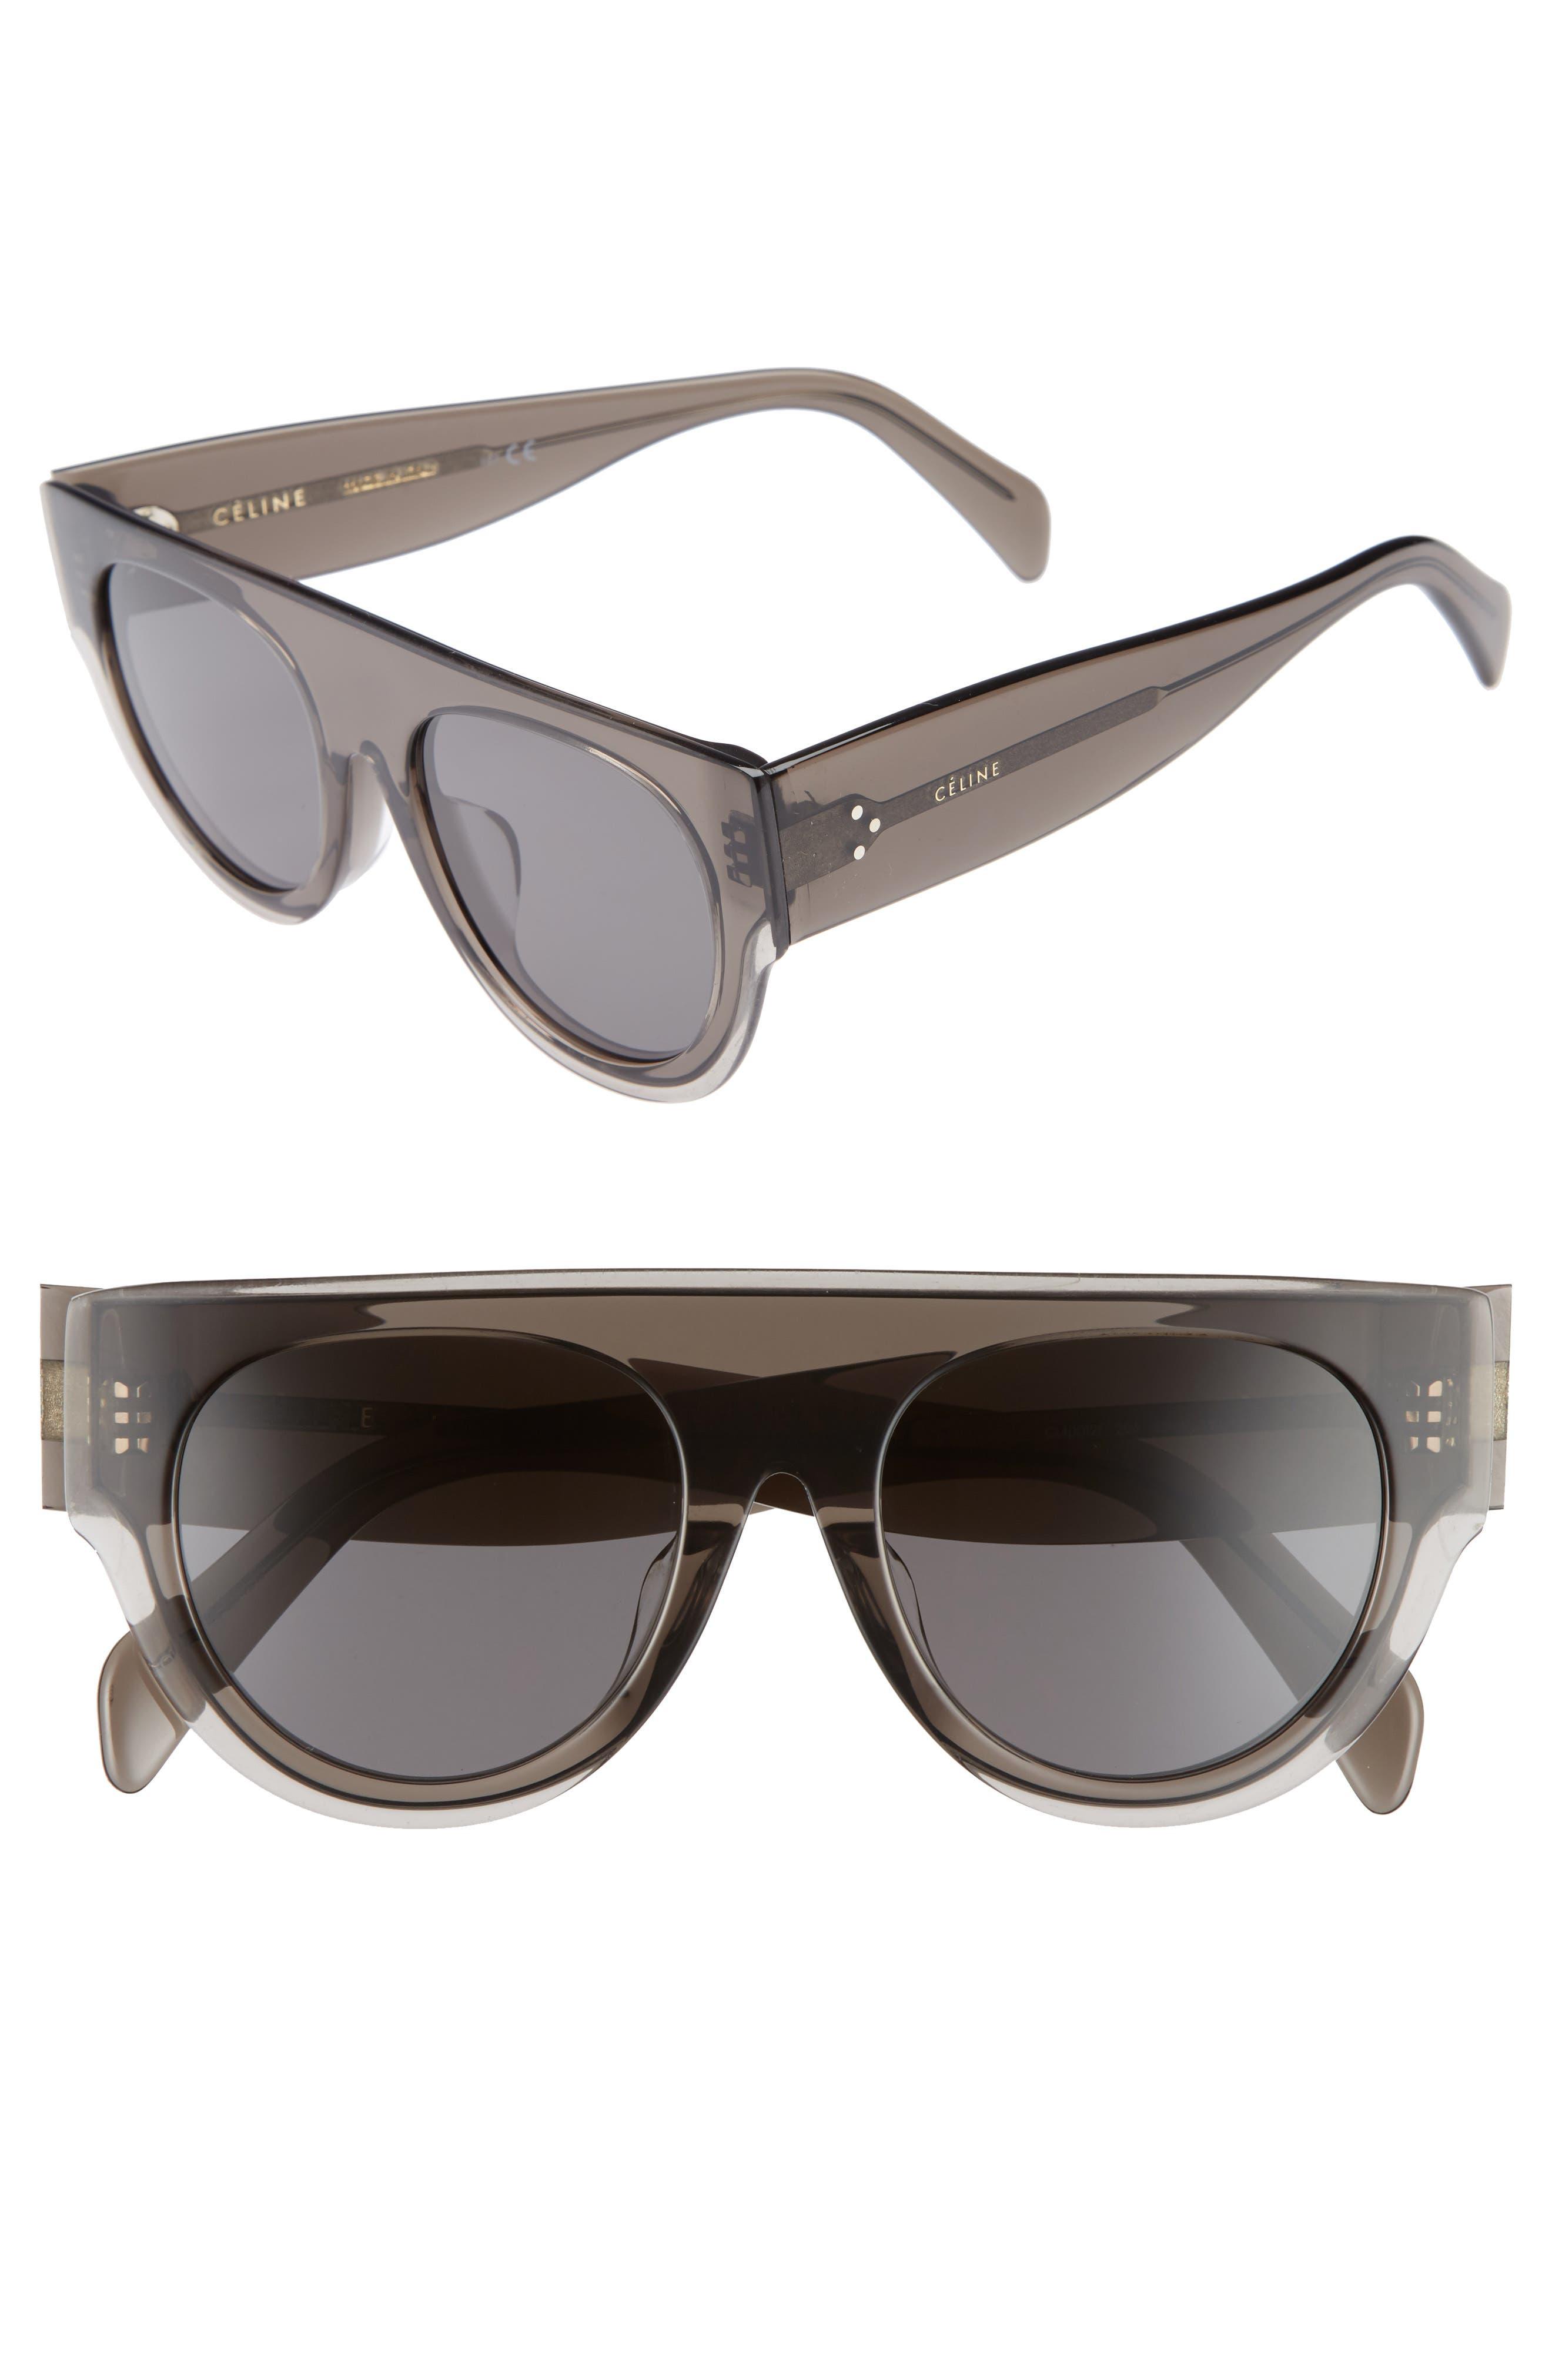 52mm Pilot Sunglasses,                             Main thumbnail 1, color,                             026